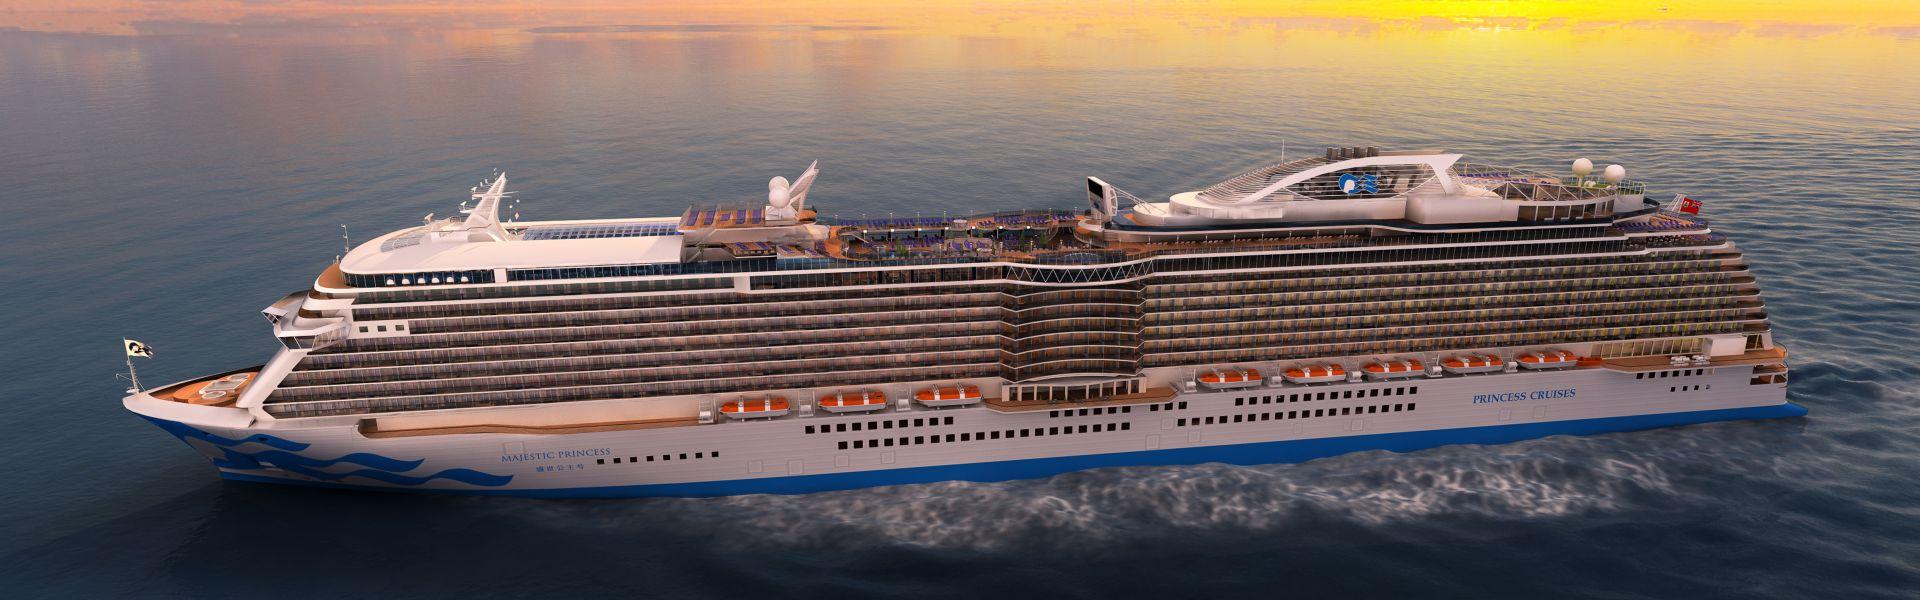 Croaziera 2017 - Mediterana de Est (Civitavecchia) - Princess Cruises - Majestic Princess - 7 nopti